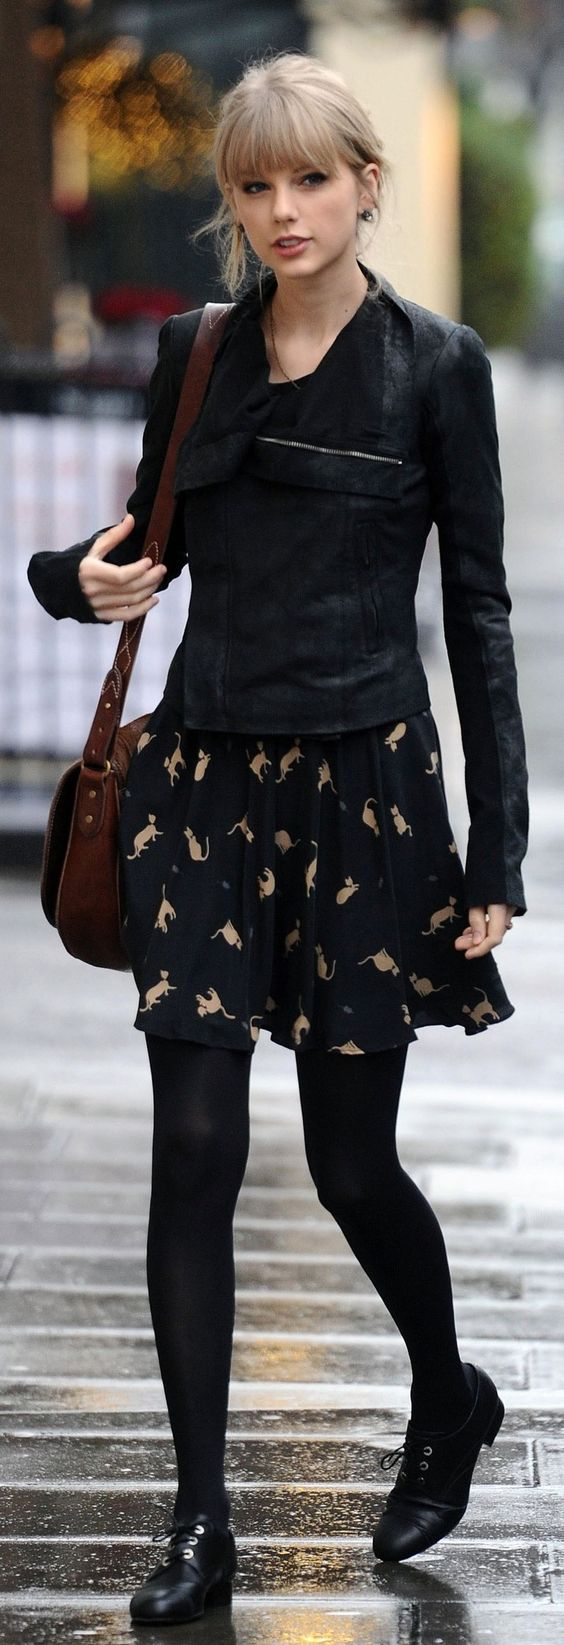 Black tights under skirt + oxfords + leather jacket. So me.: